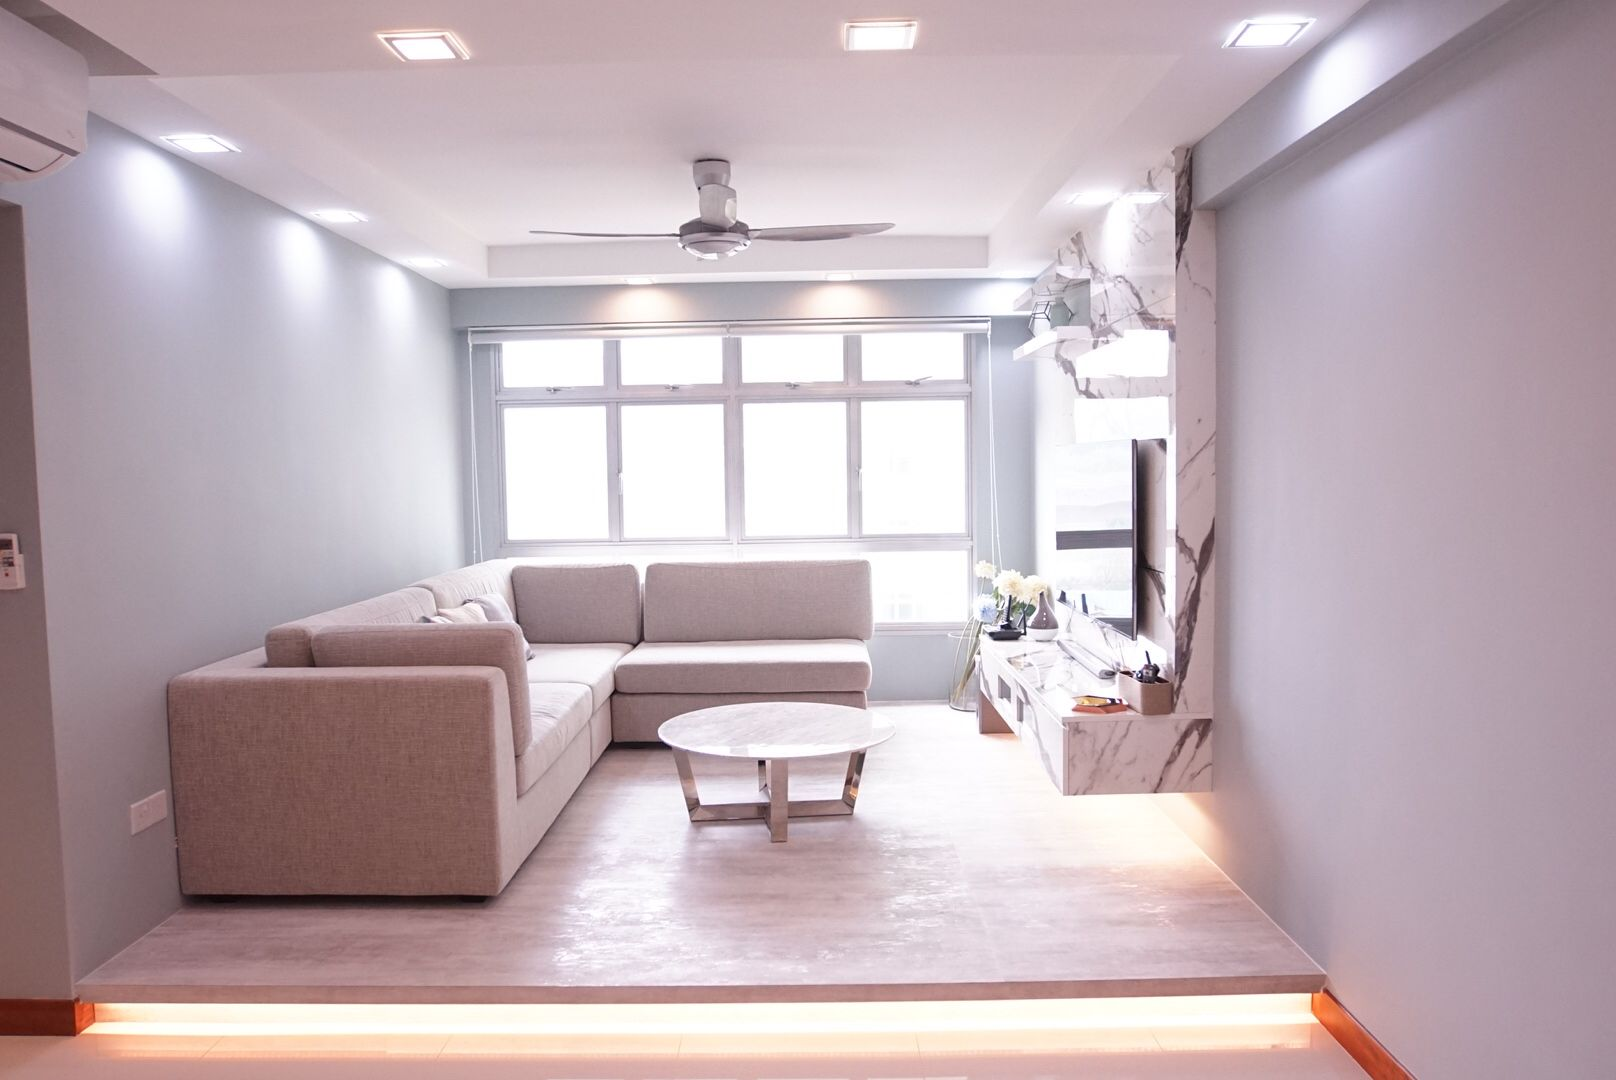 Hdb bto home reno decor minimalist marble modern living flat